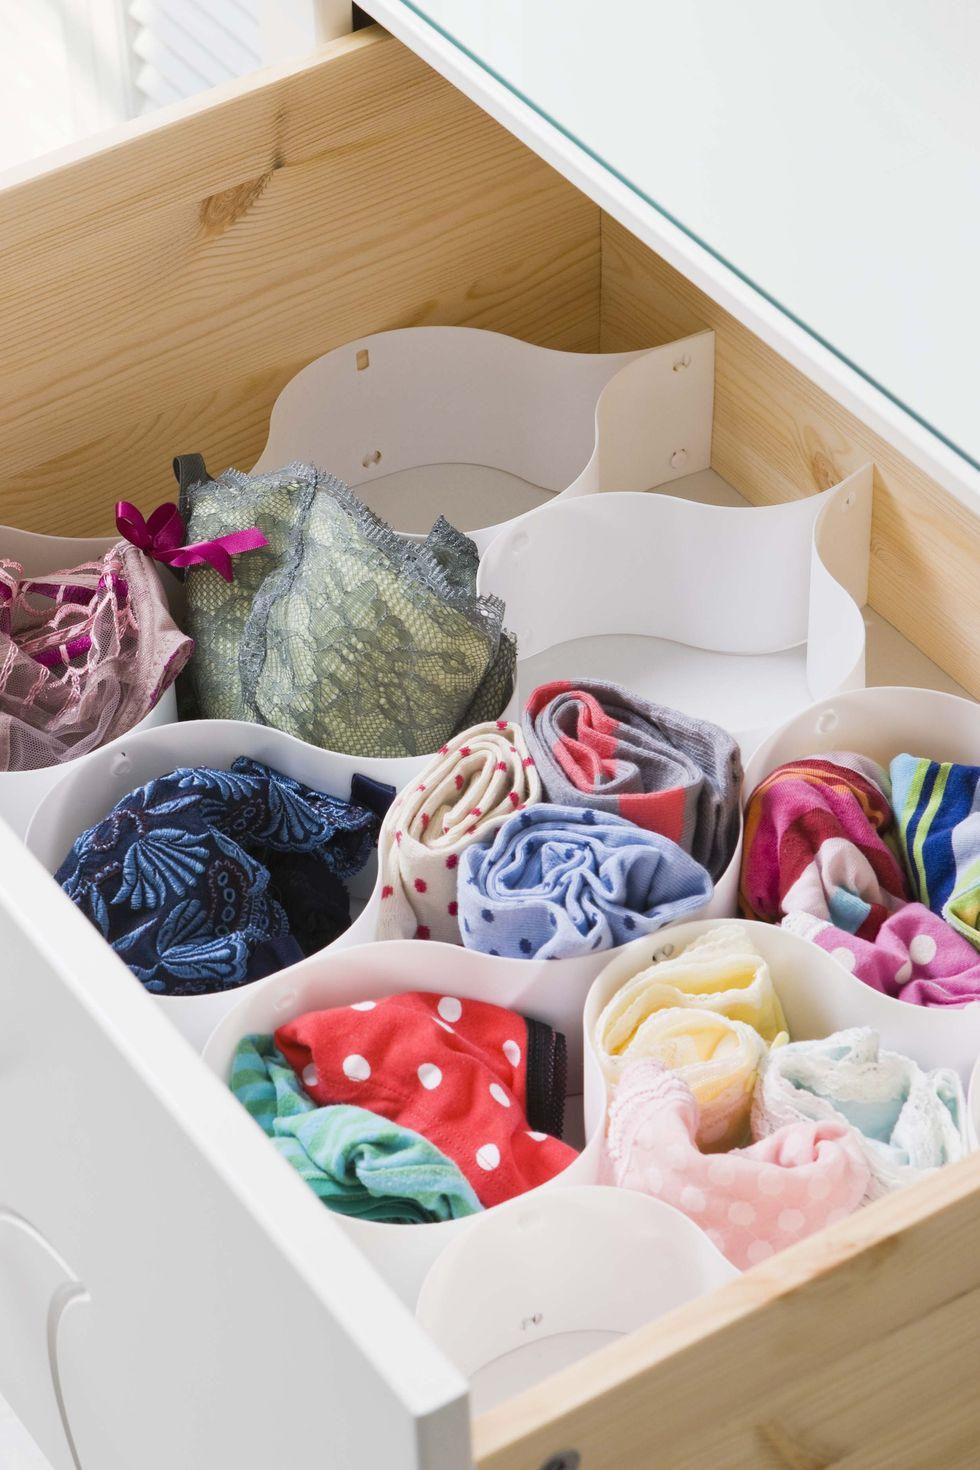 close-up-of-organizer-in-drawer-royalty-free-image-86529431-1548348991